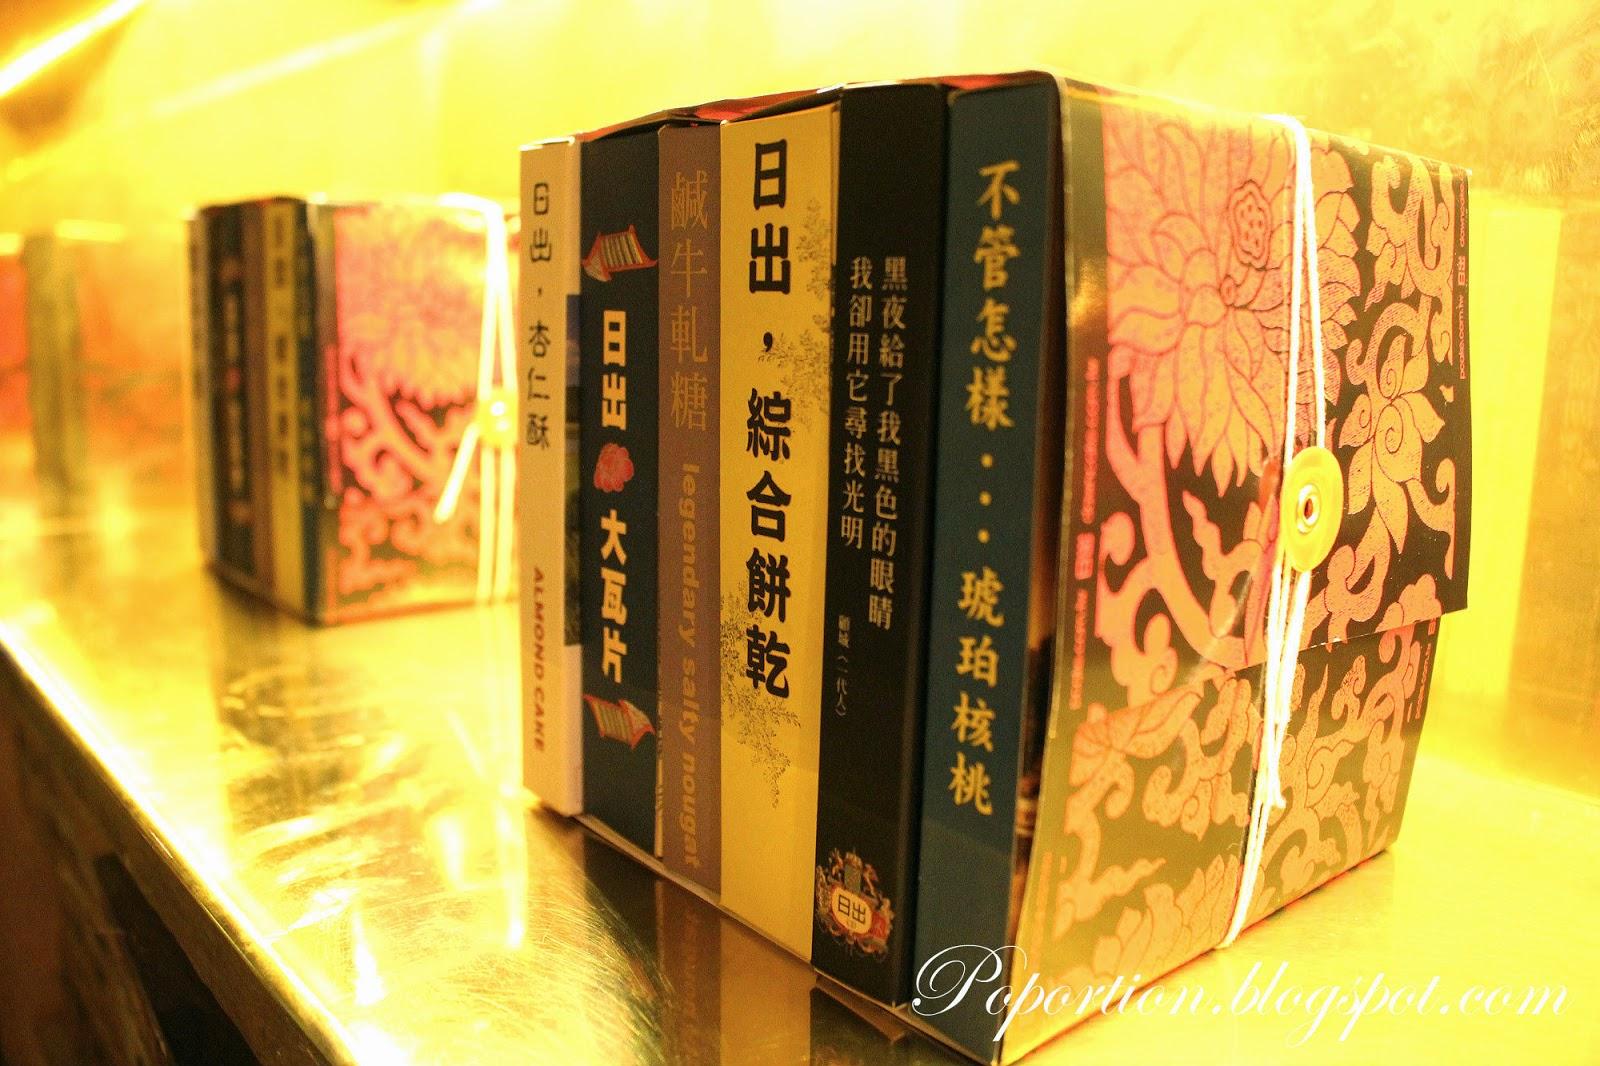 gong yuan yan ke taiwan